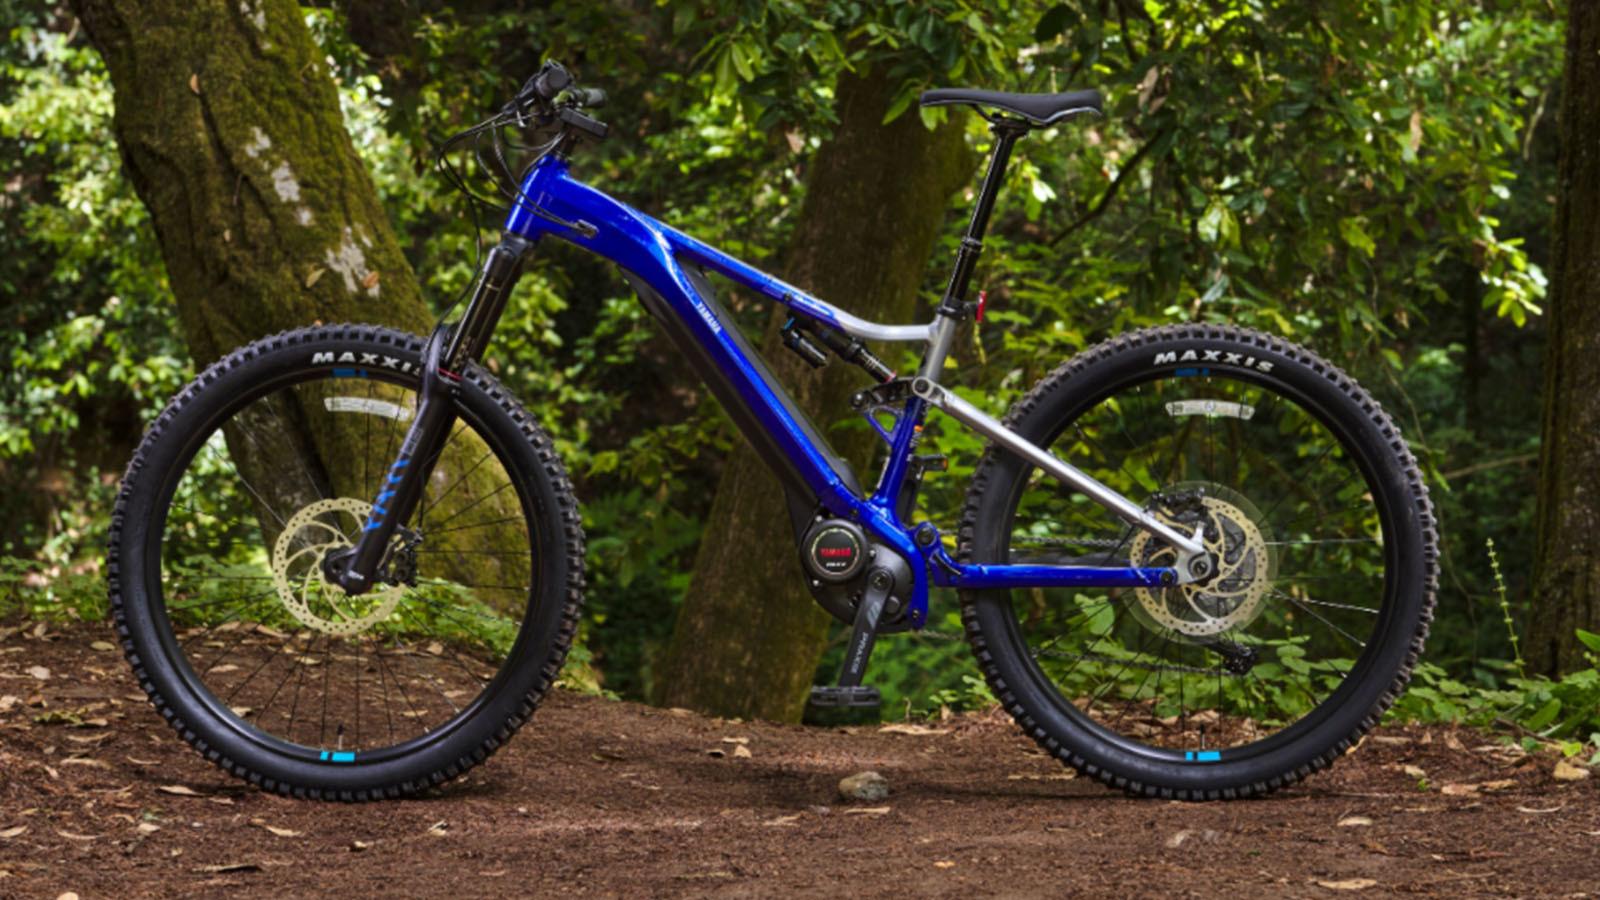 Yamaha's New, Interesting, e-MTB is Here